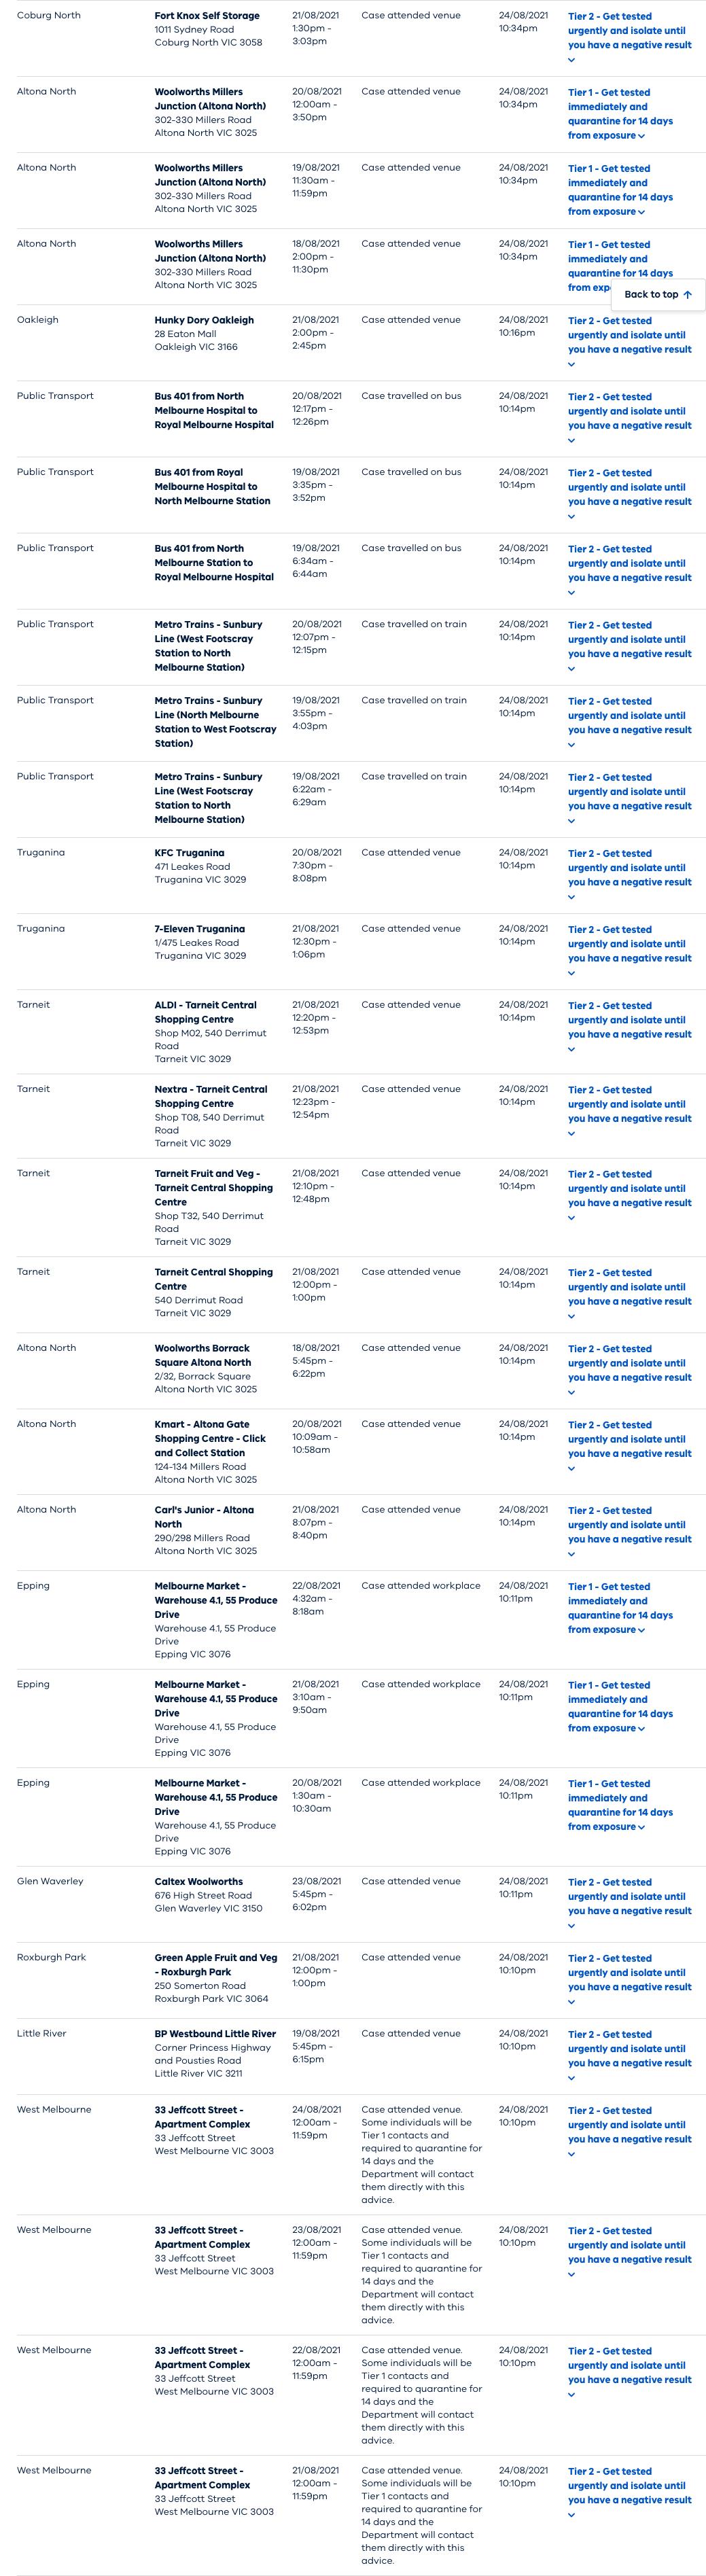 www.coronavirus.vic.gov.au_exposure-sites (5).png